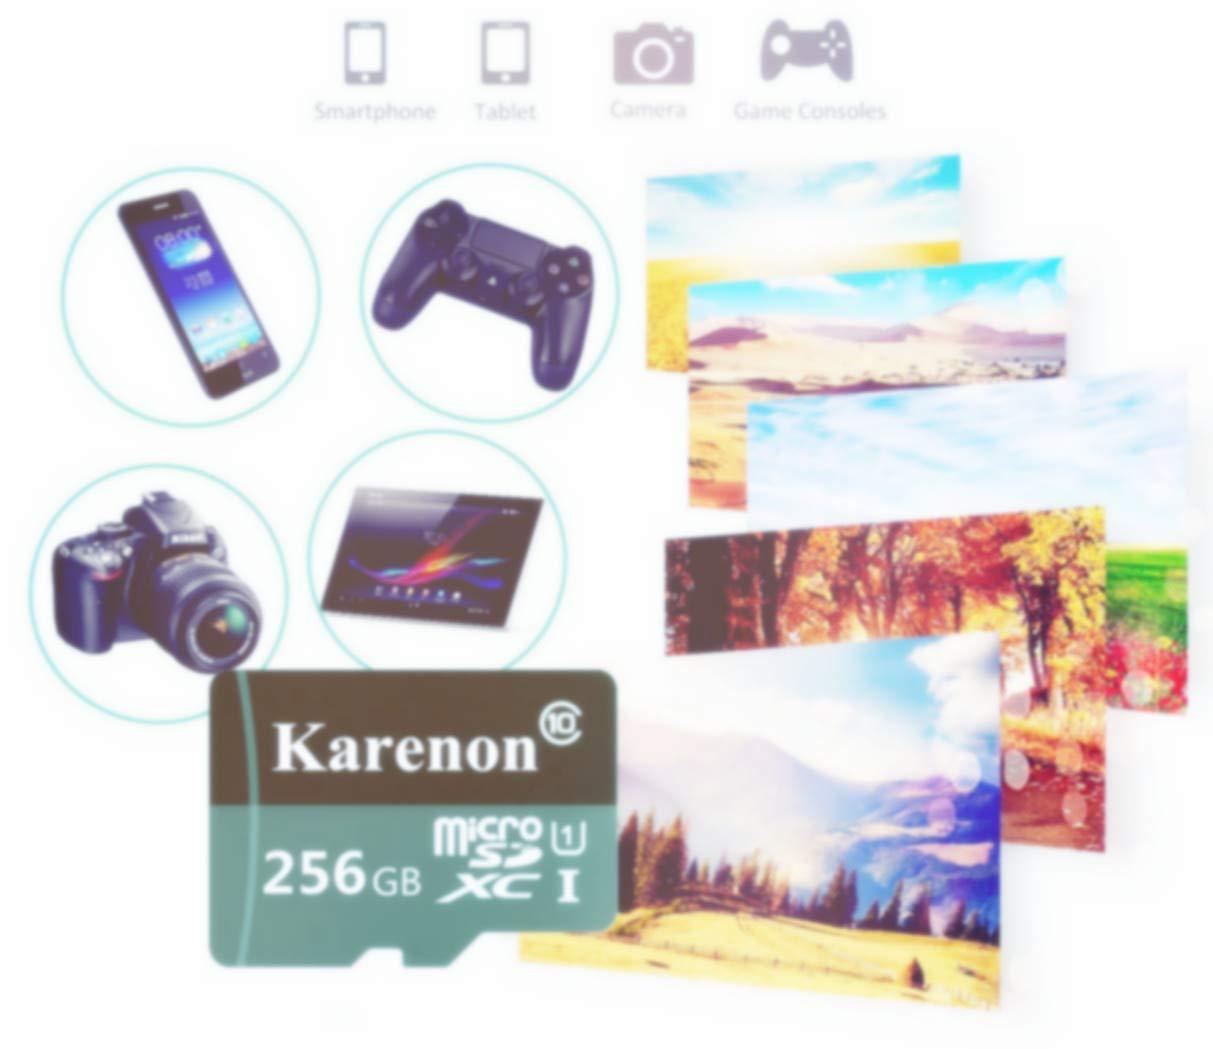 Karenon Tarjeta Micro SD 256 GB, microSDXC 256 GB Class 10 Tarjeta de Memoria + Adaptador (DY135-GF) (256 GB)